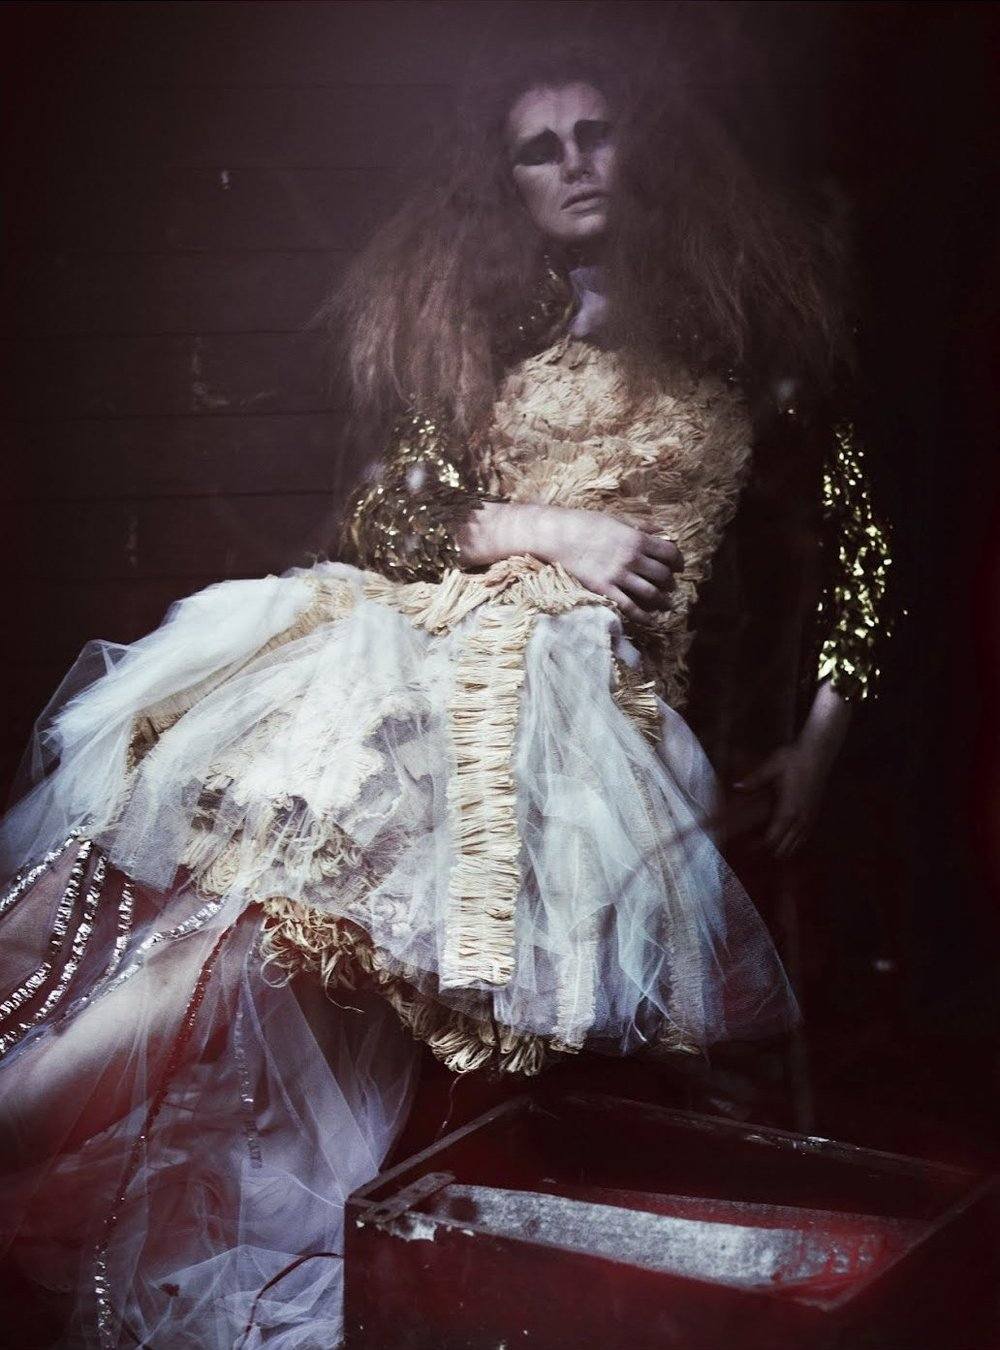 photographicpictures: Kelly Mittendorf by Serge Leblon - John Rocha + Vionnet S/S 2012